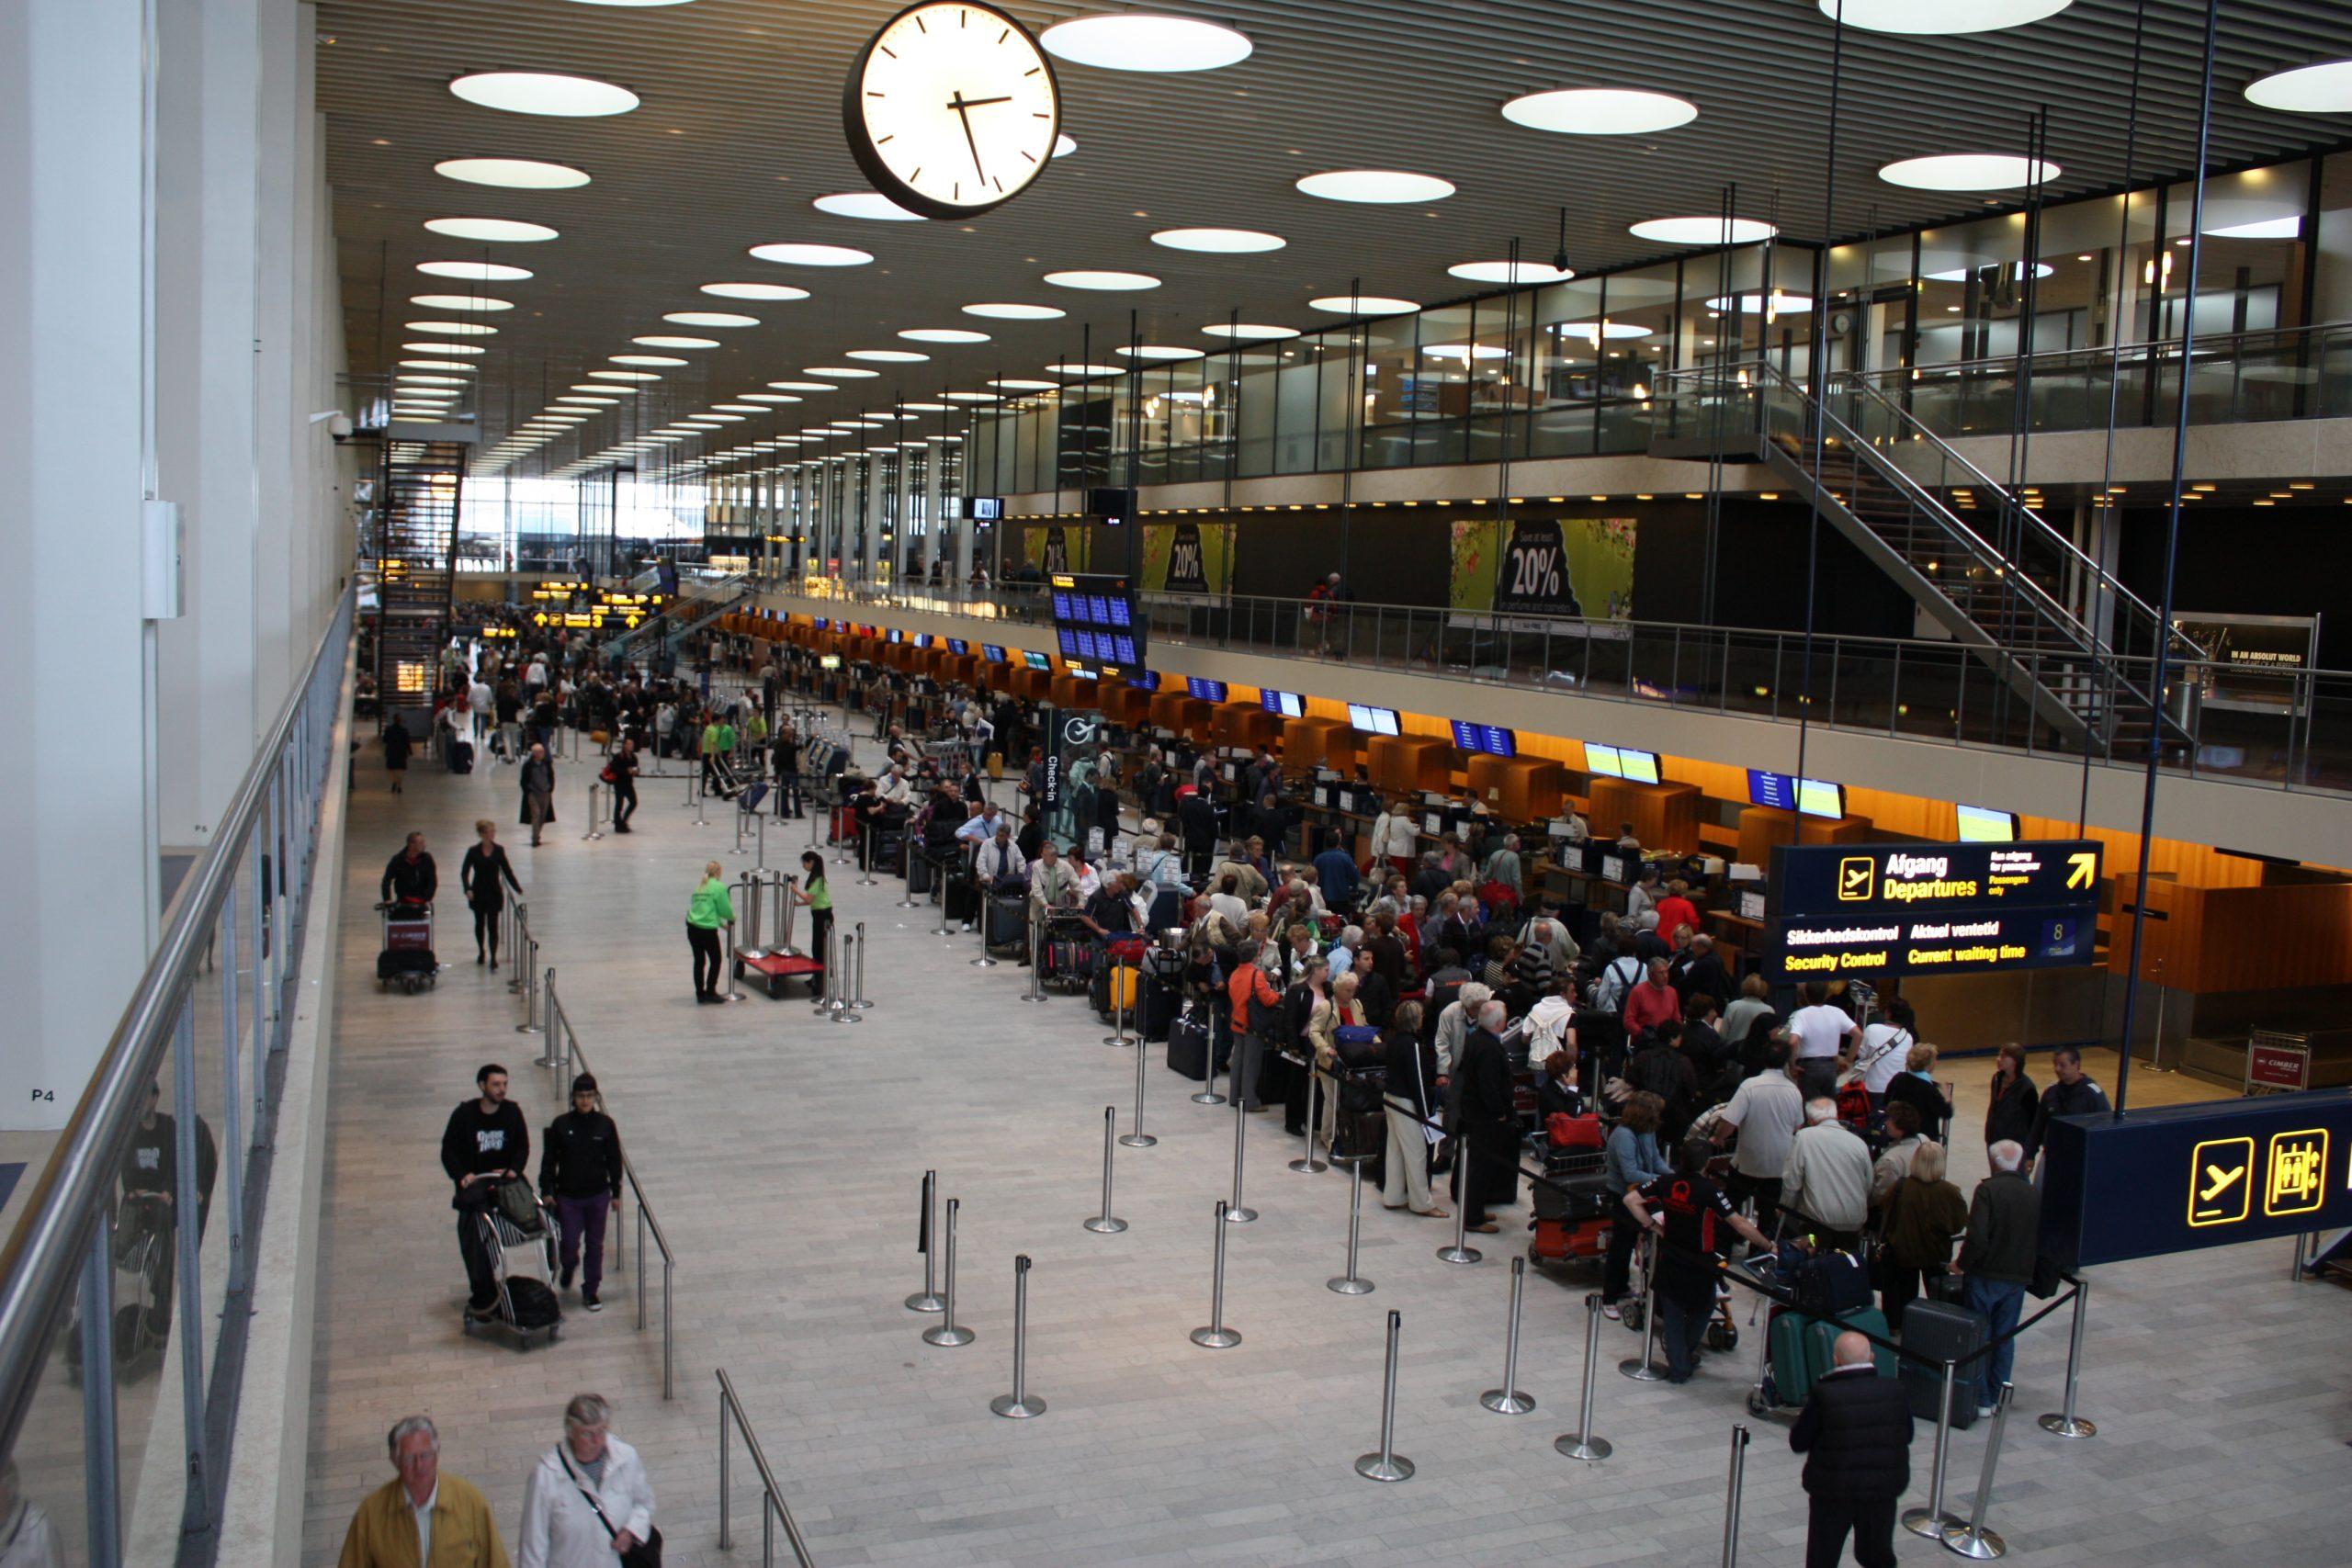 Copenhagen Airport - Popular Tourist Destinations in Copenhagen